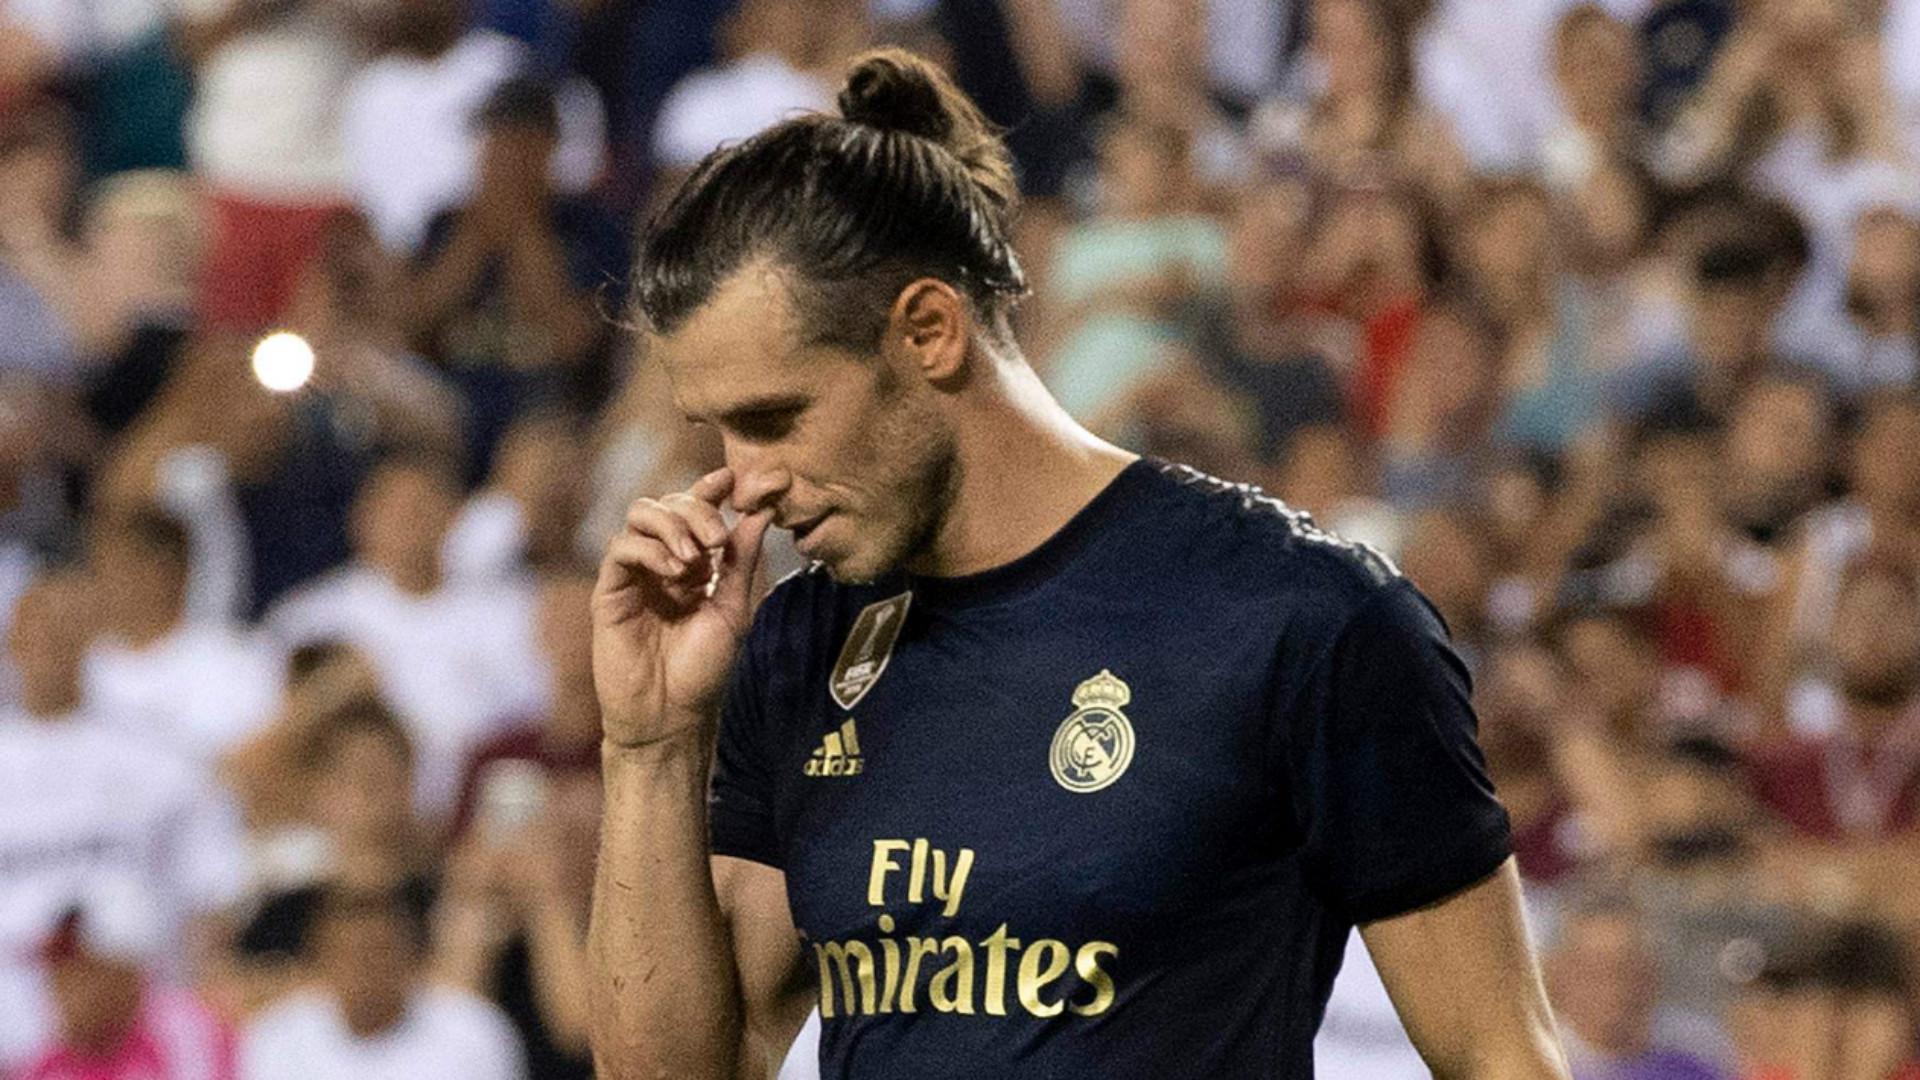 Bale in Cina - Proposto ingaggio monstre all'ex Tottenham